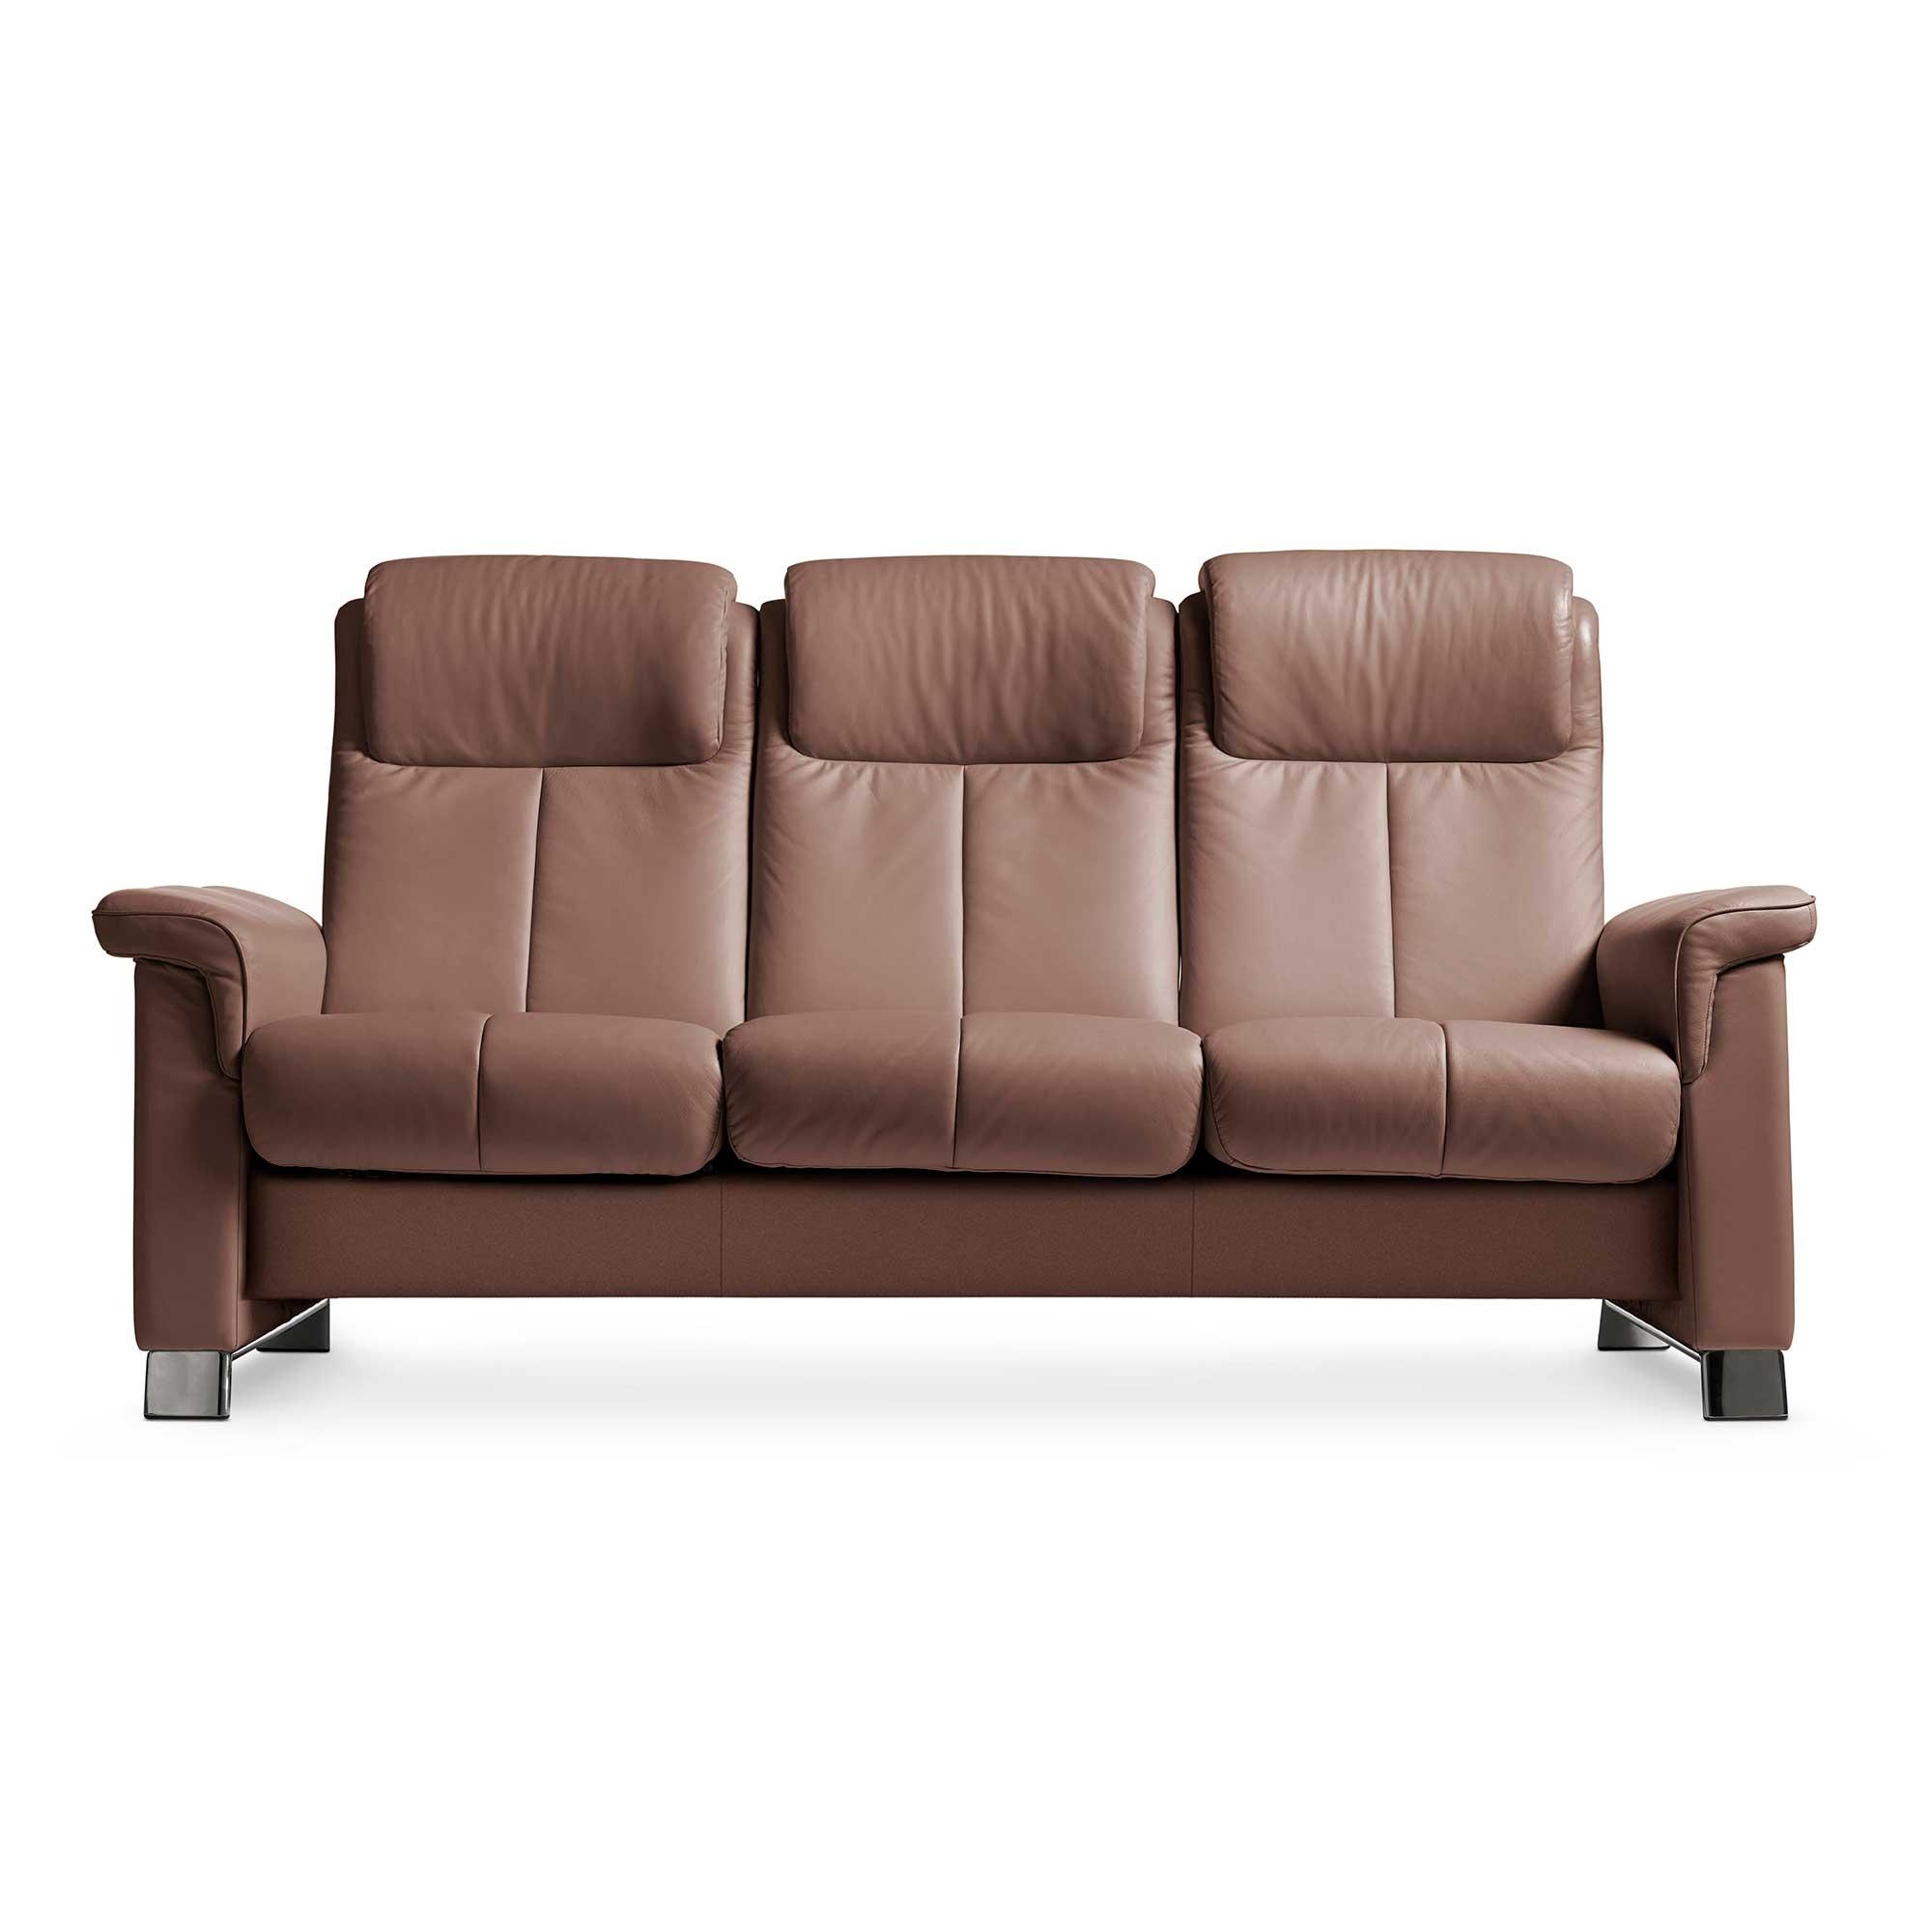 Sofas Stressless Q0d4 Stressless Breeze 3 Seater Recliner sofa sofas Living Room